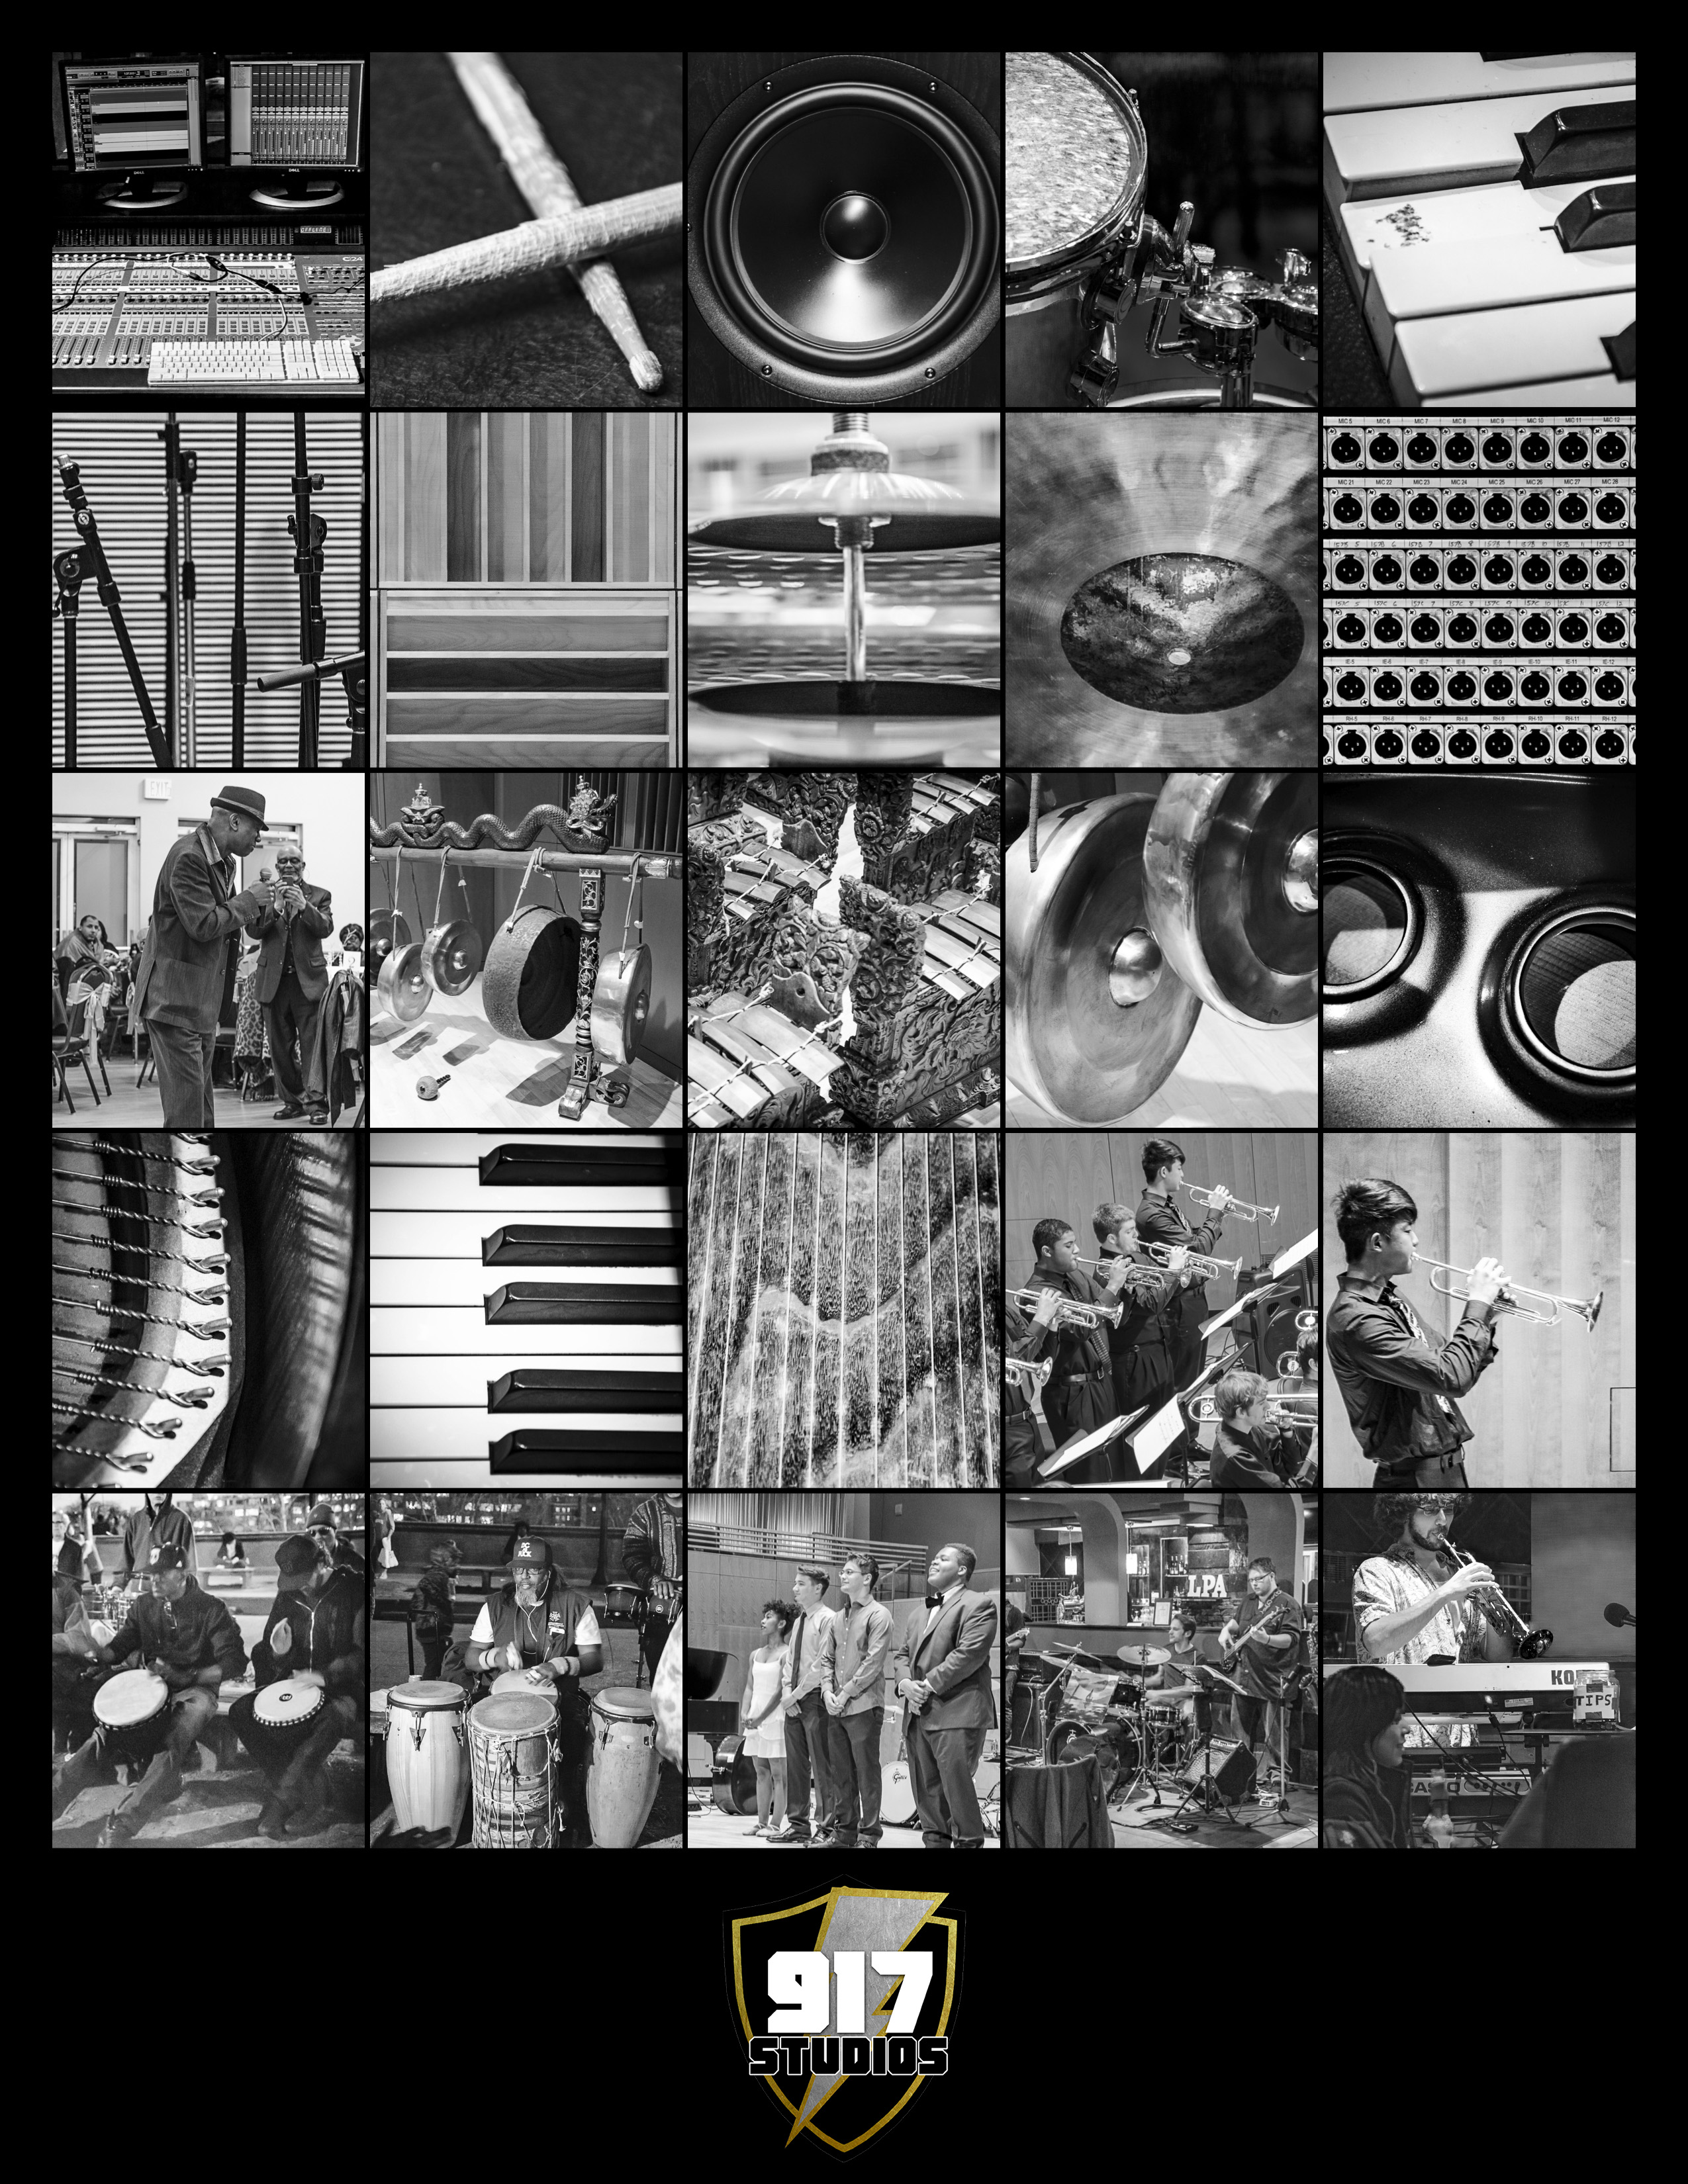 917 Studios Promotion